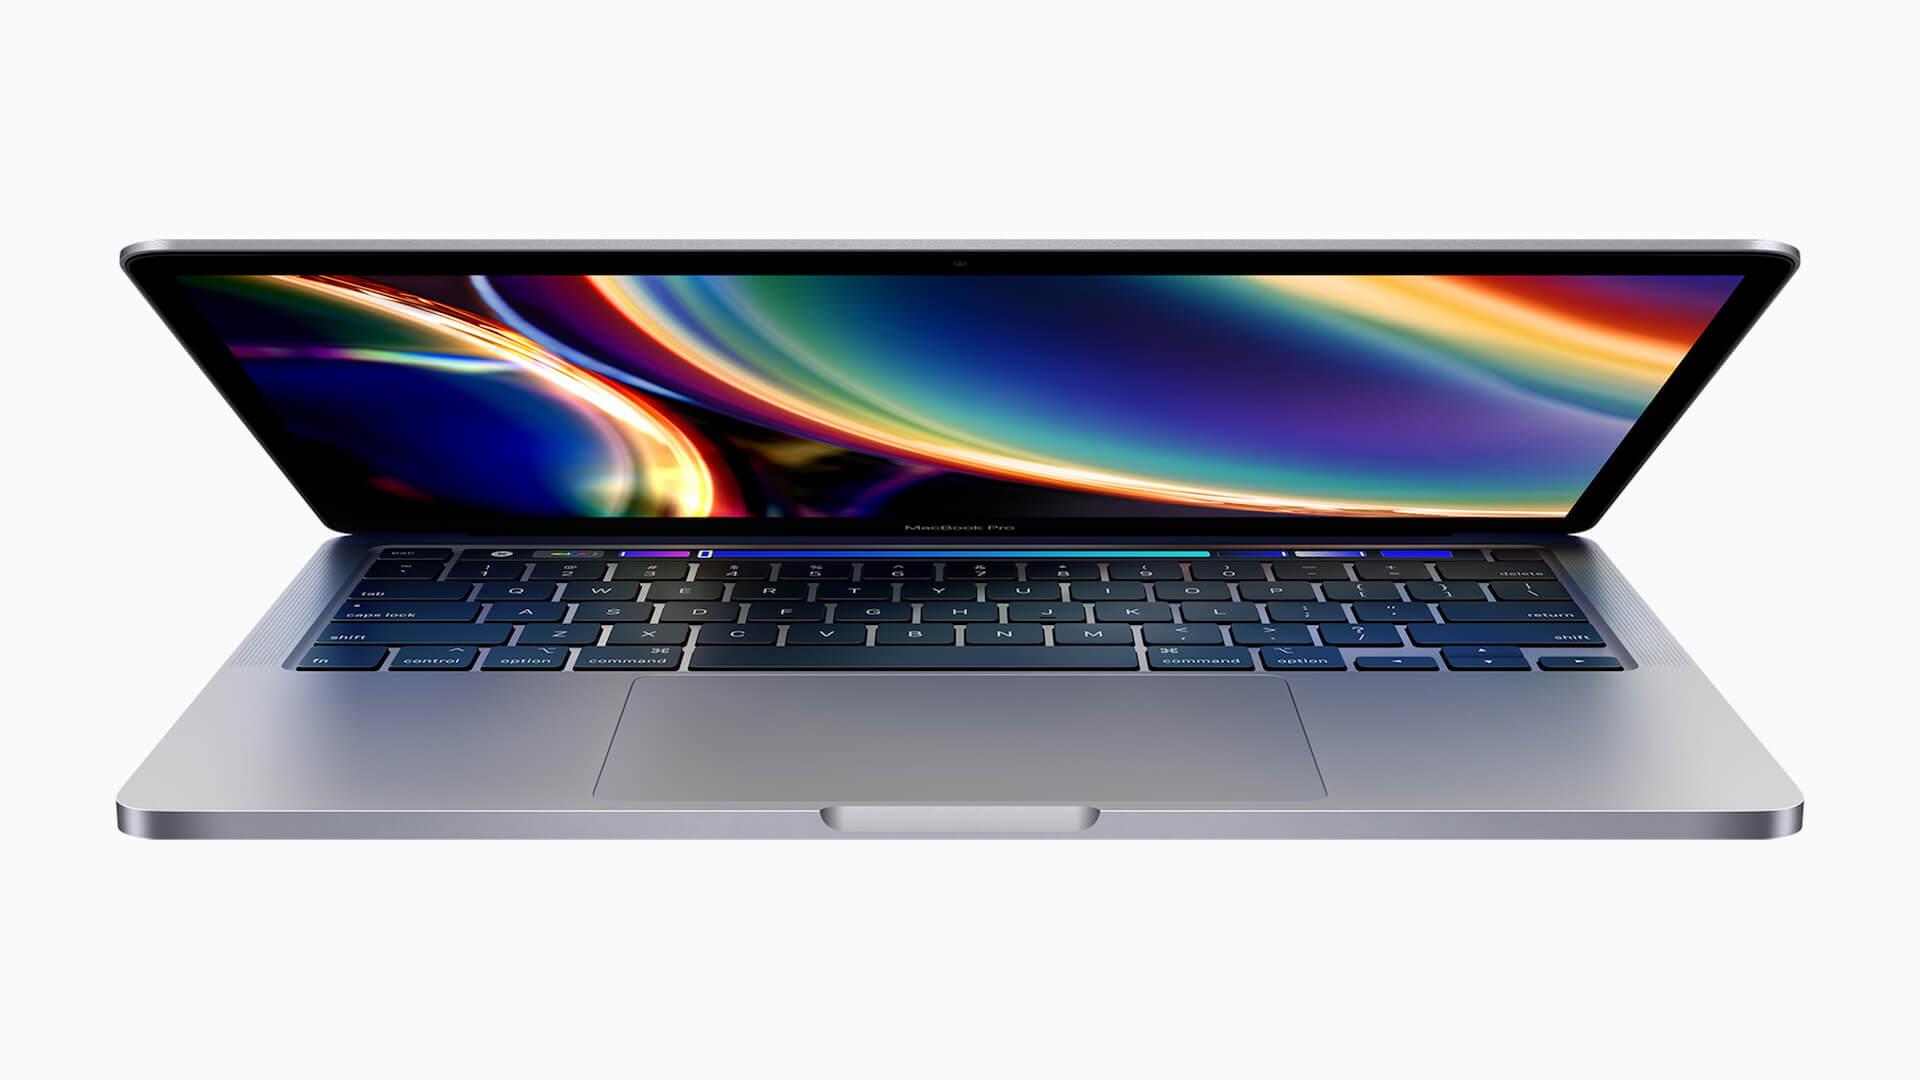 MacBook Proにやはり新サイズ登場!?2021年前半に14インチMacBook Proが発表か tech200512_macbookpro_1